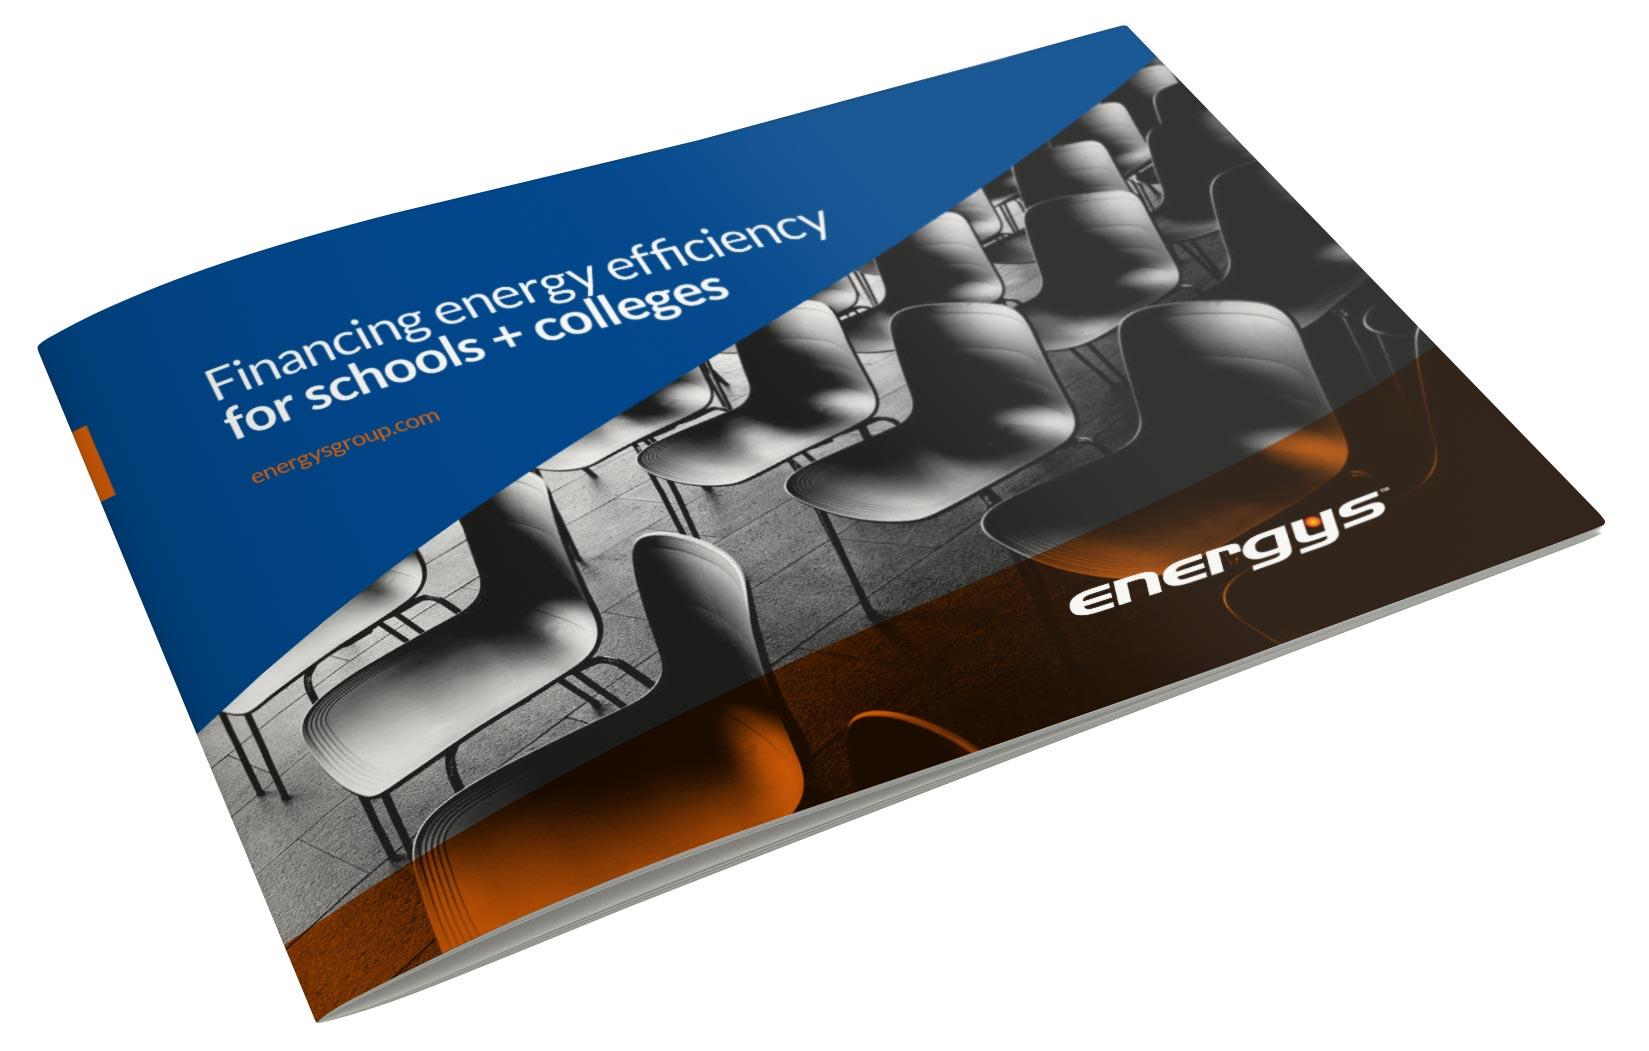 Energys Schools Brochure Mockup